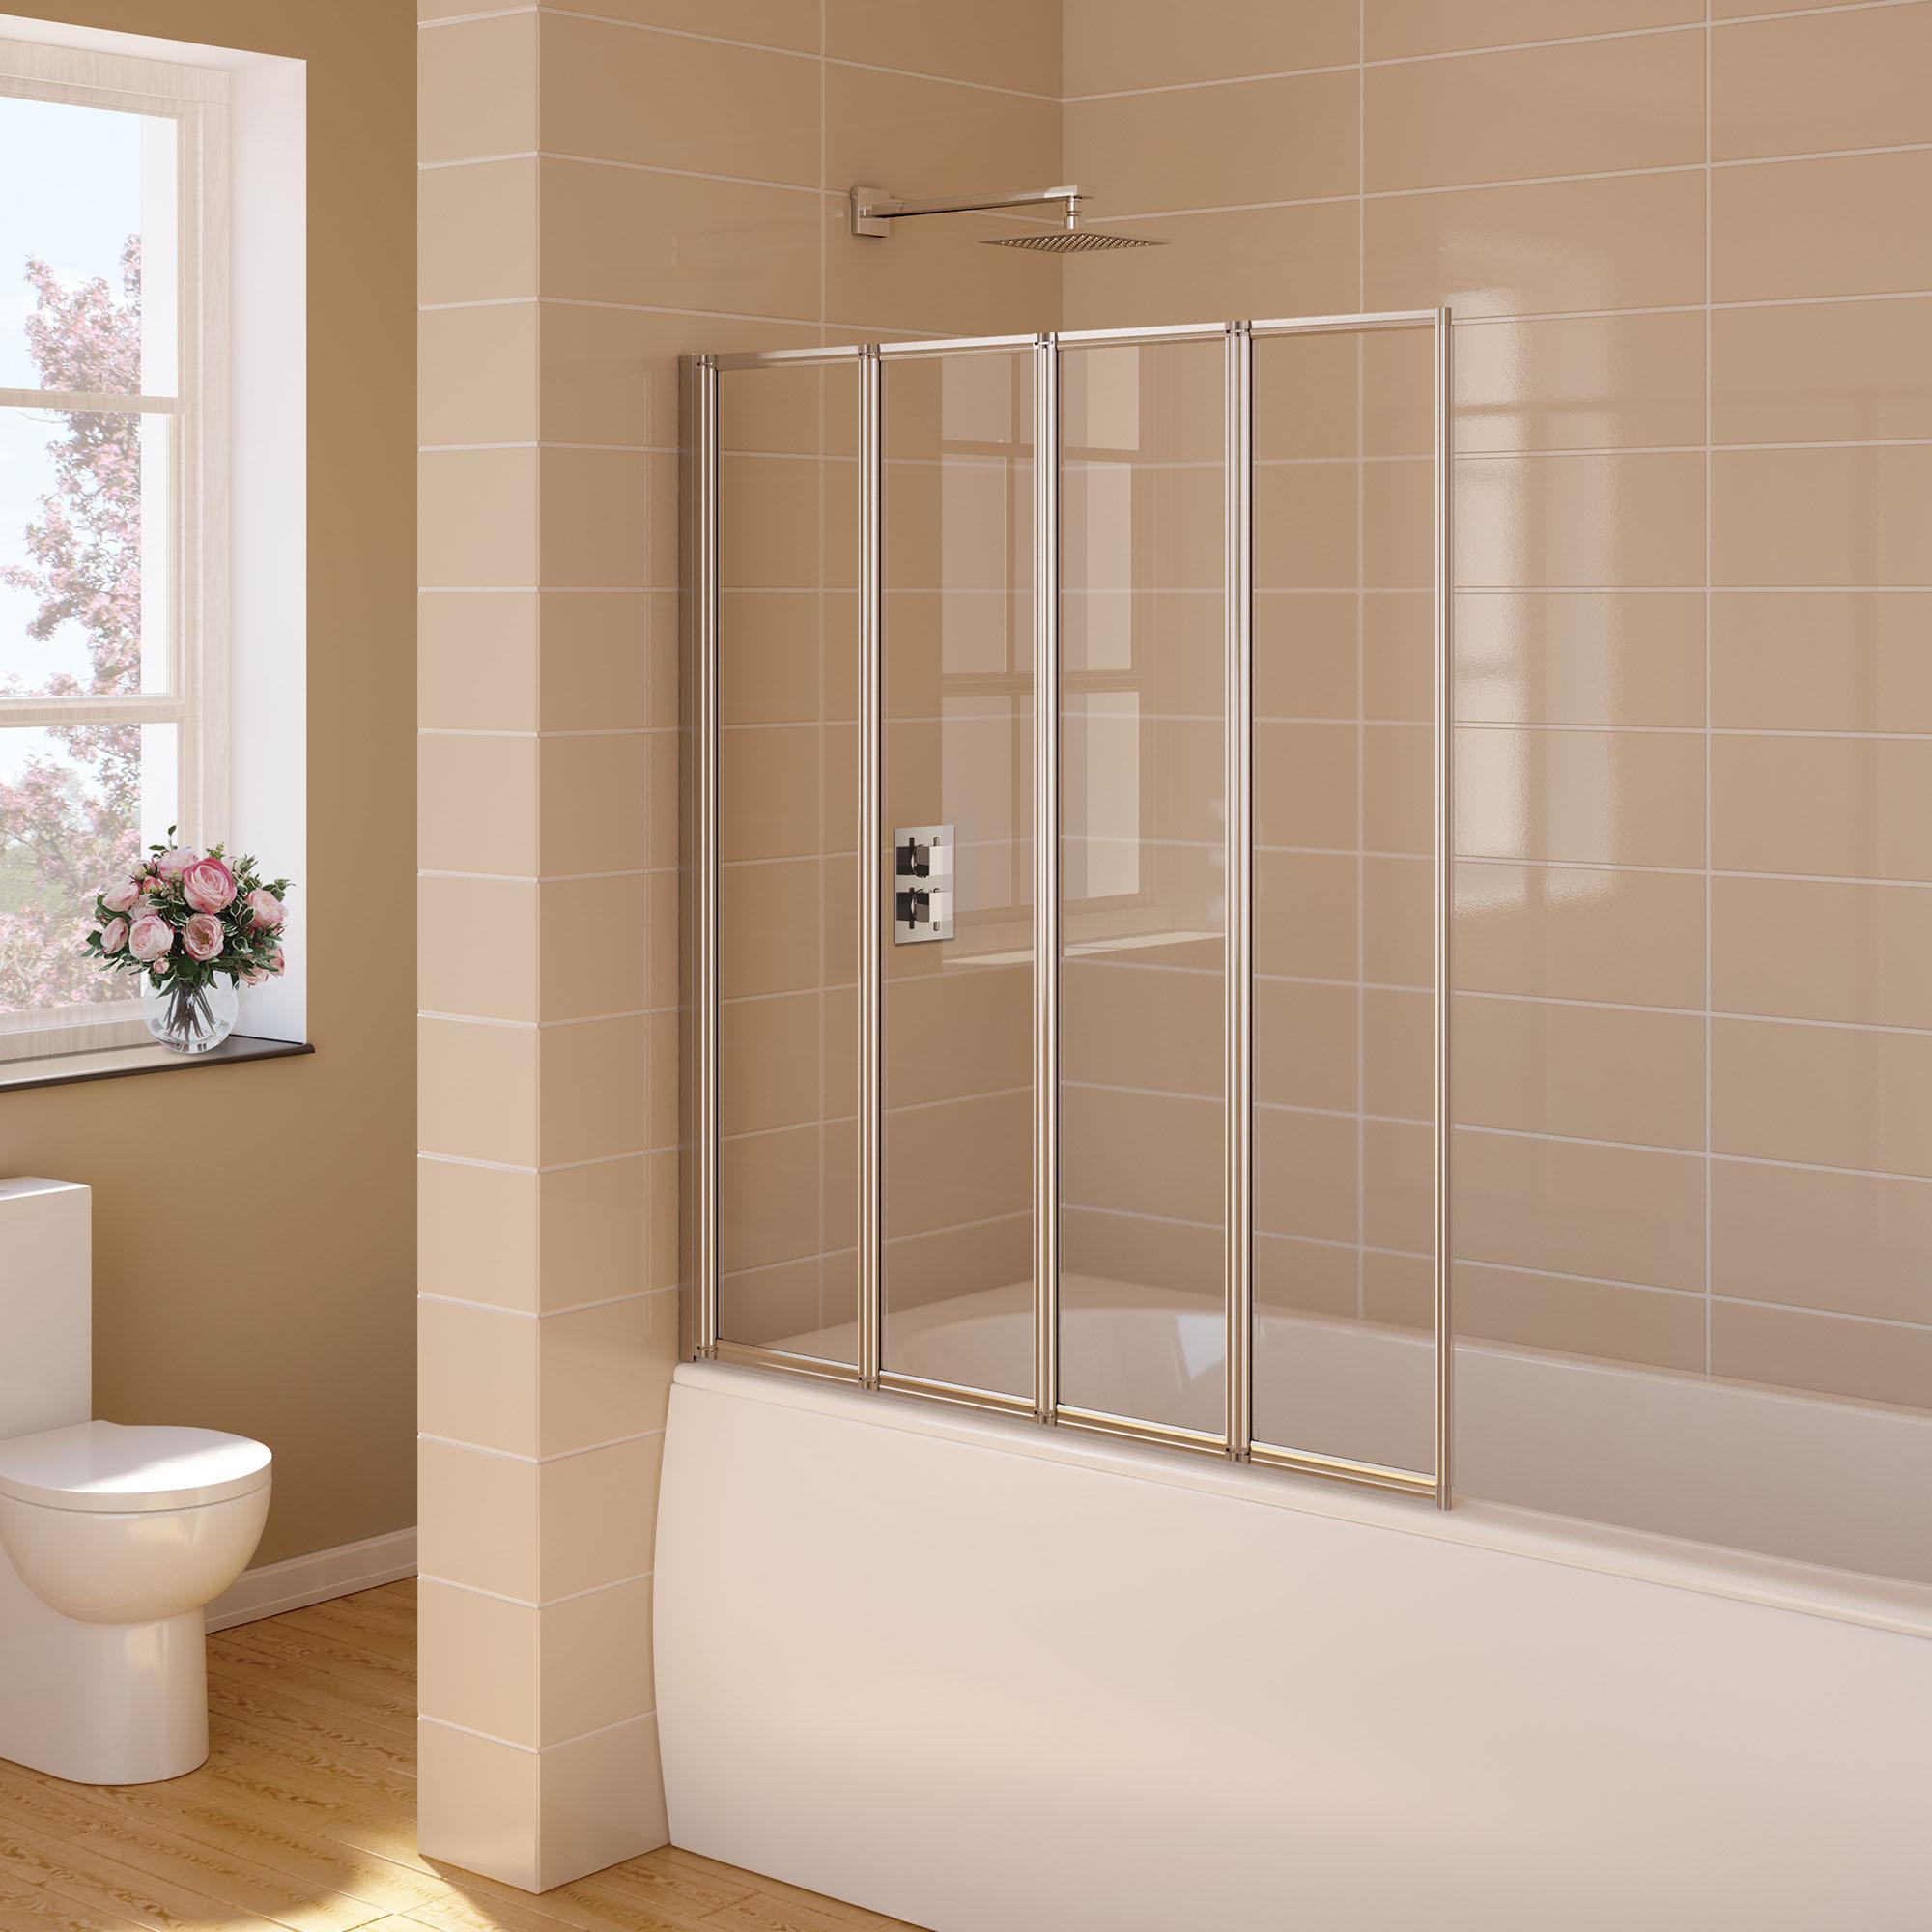 1000mm folding bath shower screen modern designer glass aqua 6 splash guard 300mm with rail fbs0180aqu